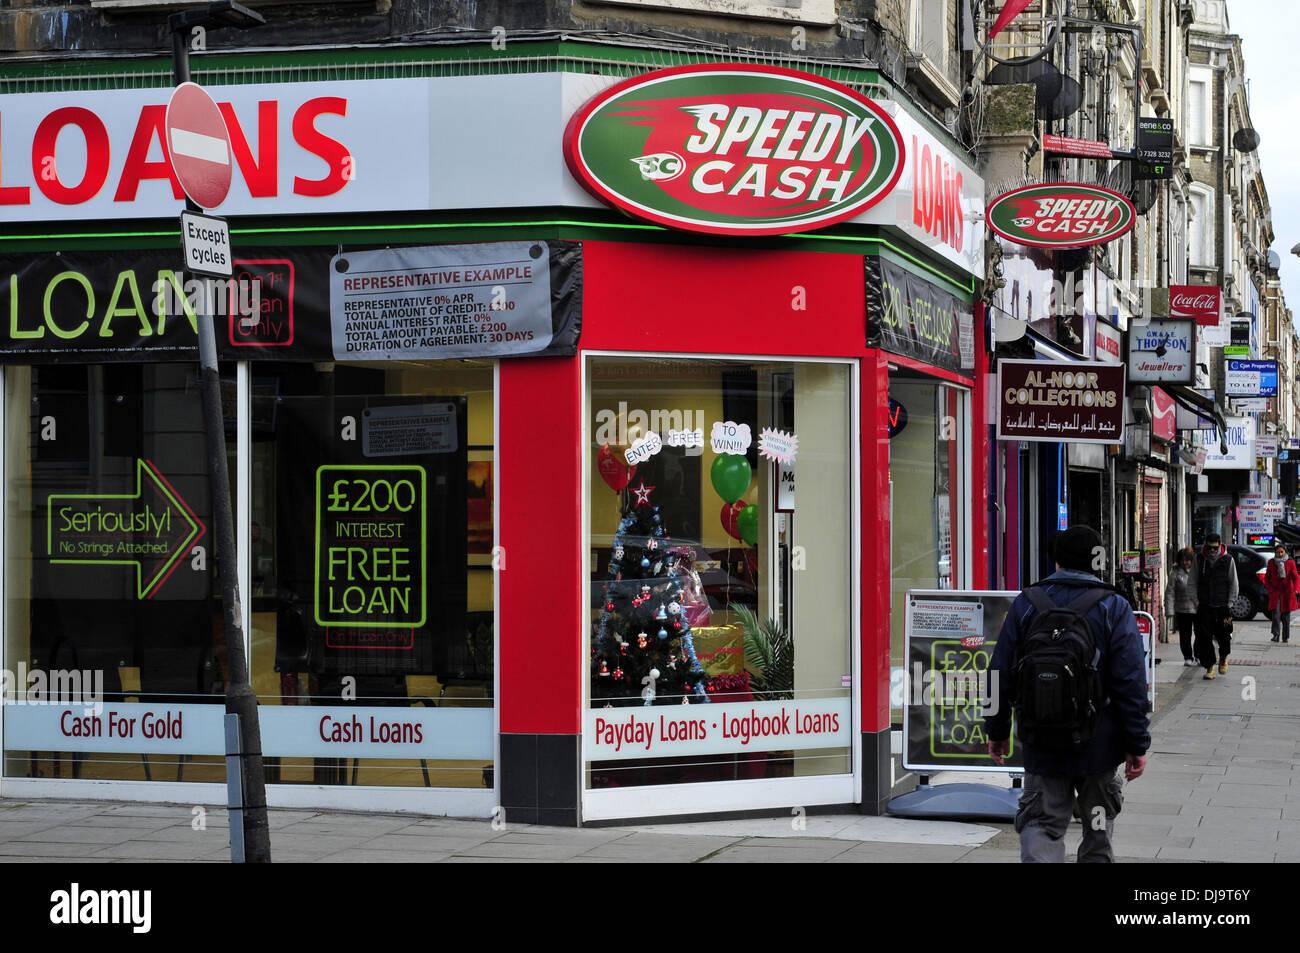 Loanshop Payday Loans